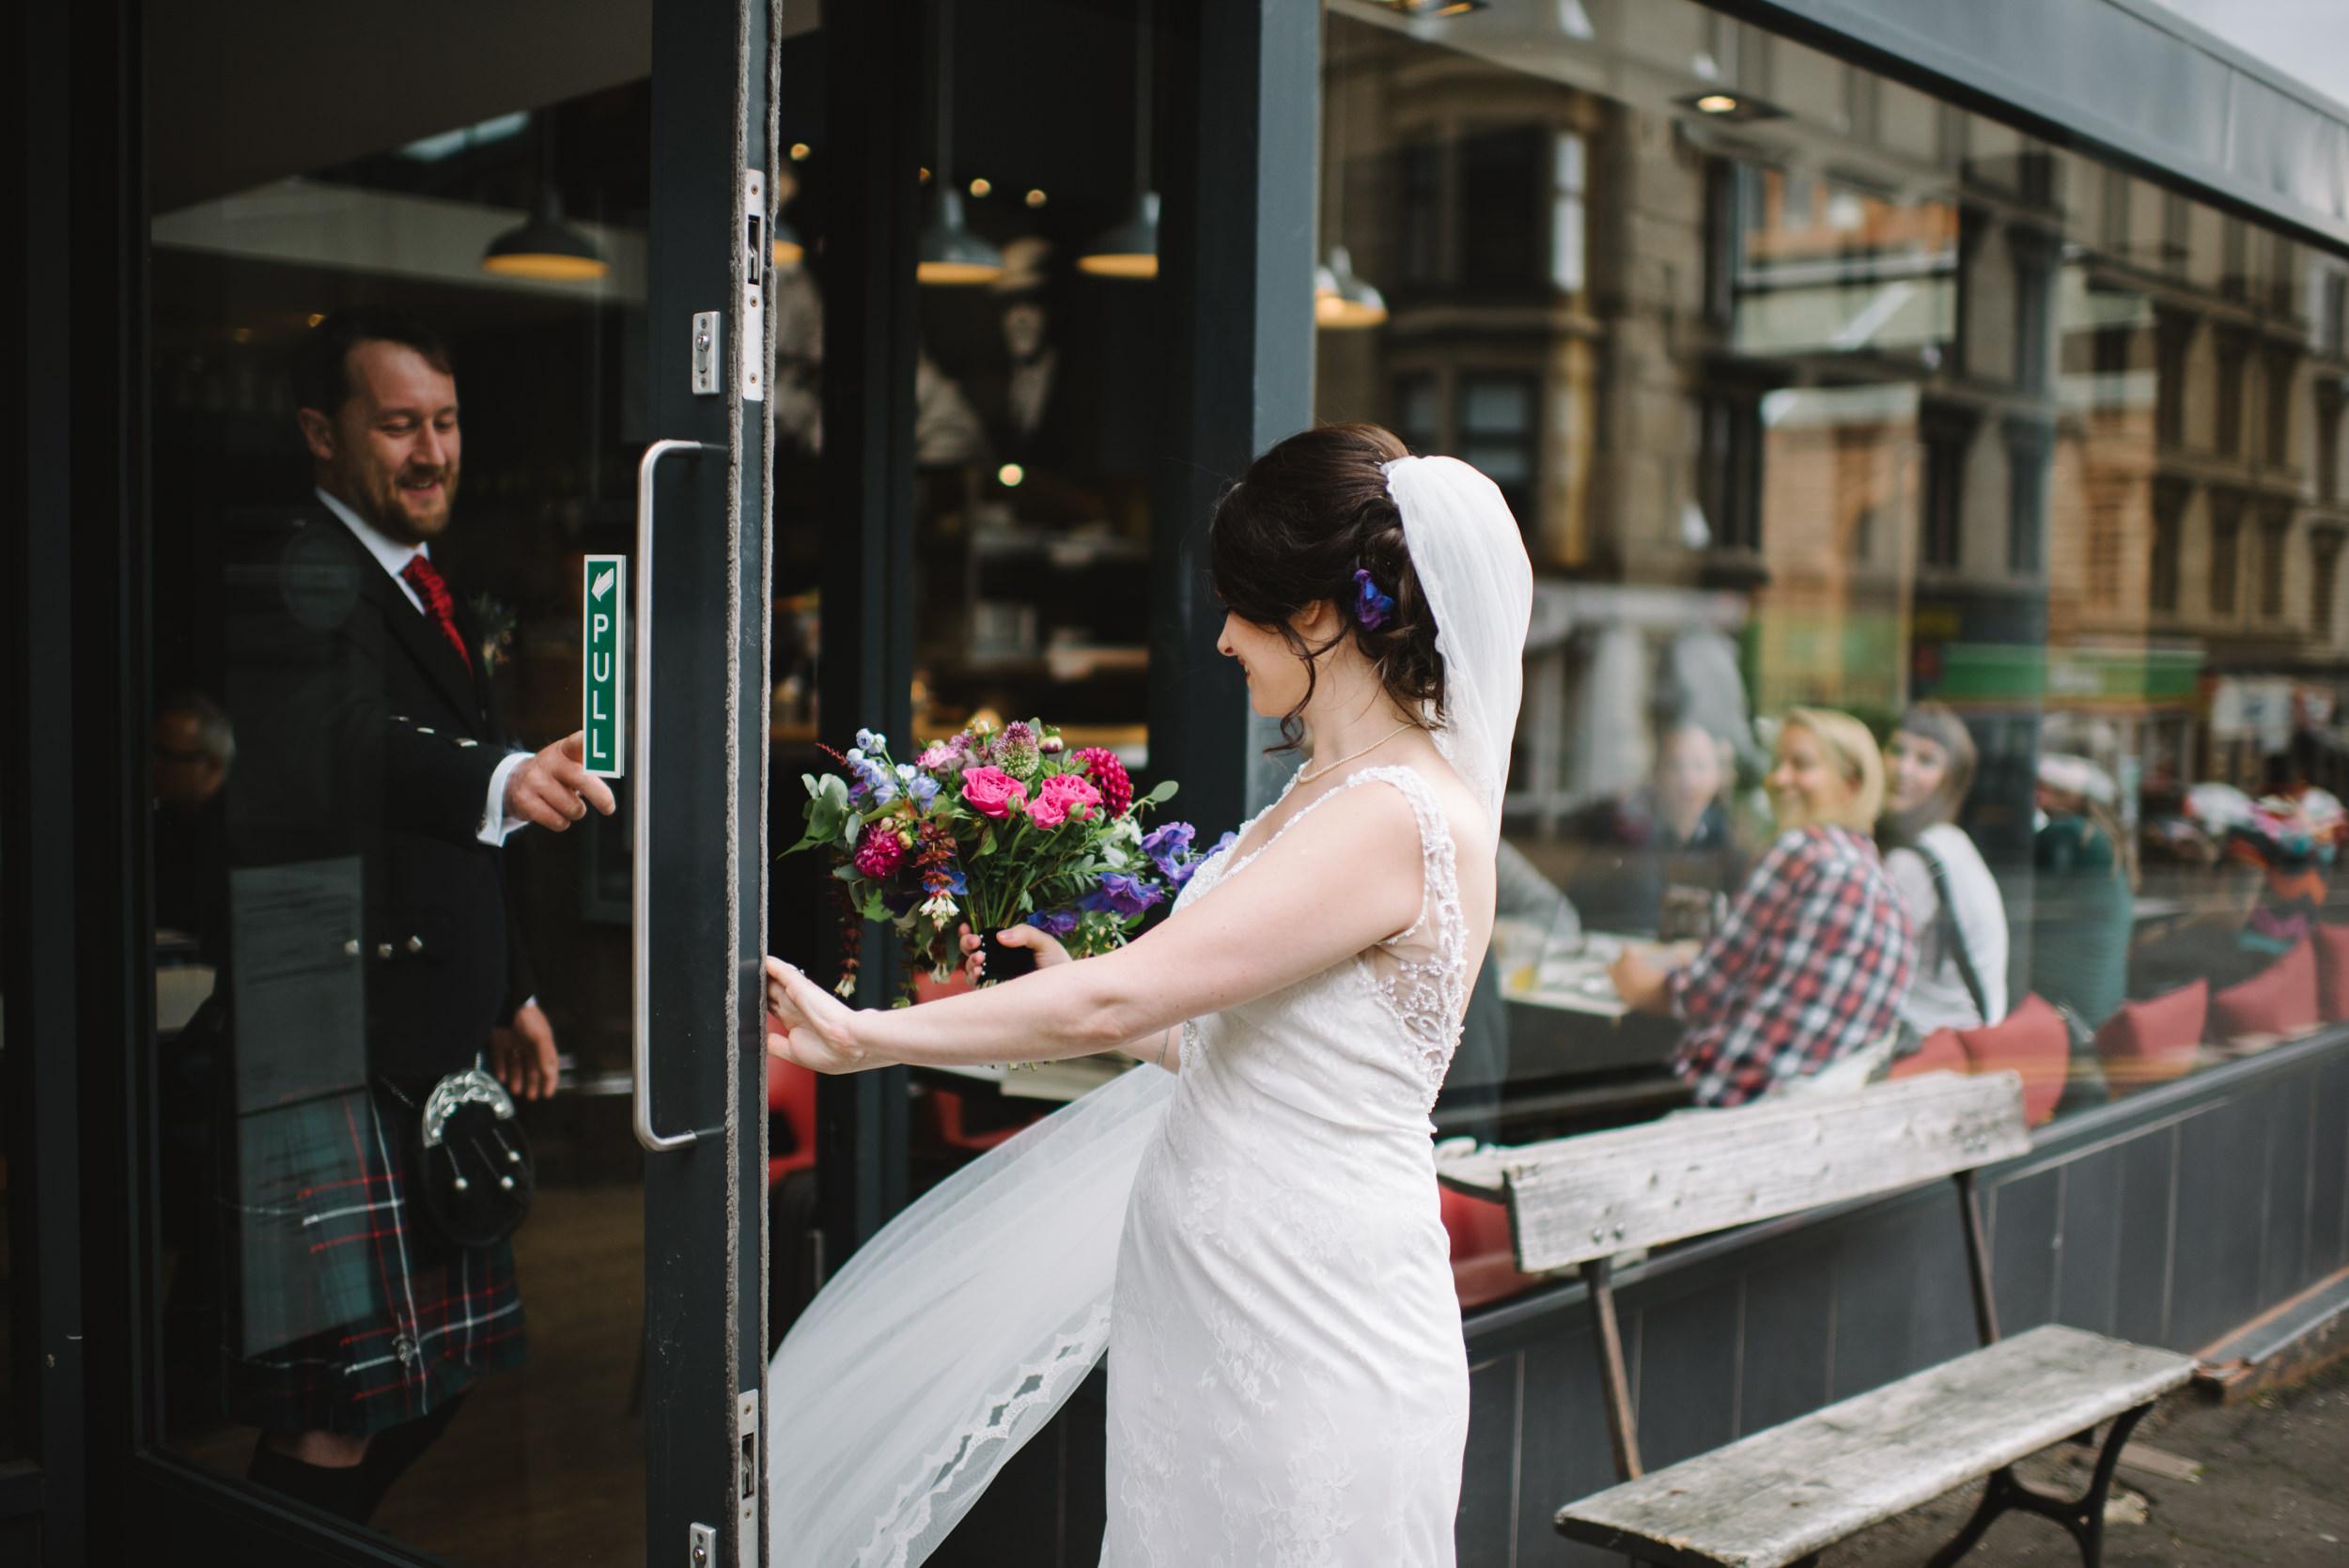 0163-alternative-wedding-portrait-family-kids-photographer-glasgow-scotland.JPG